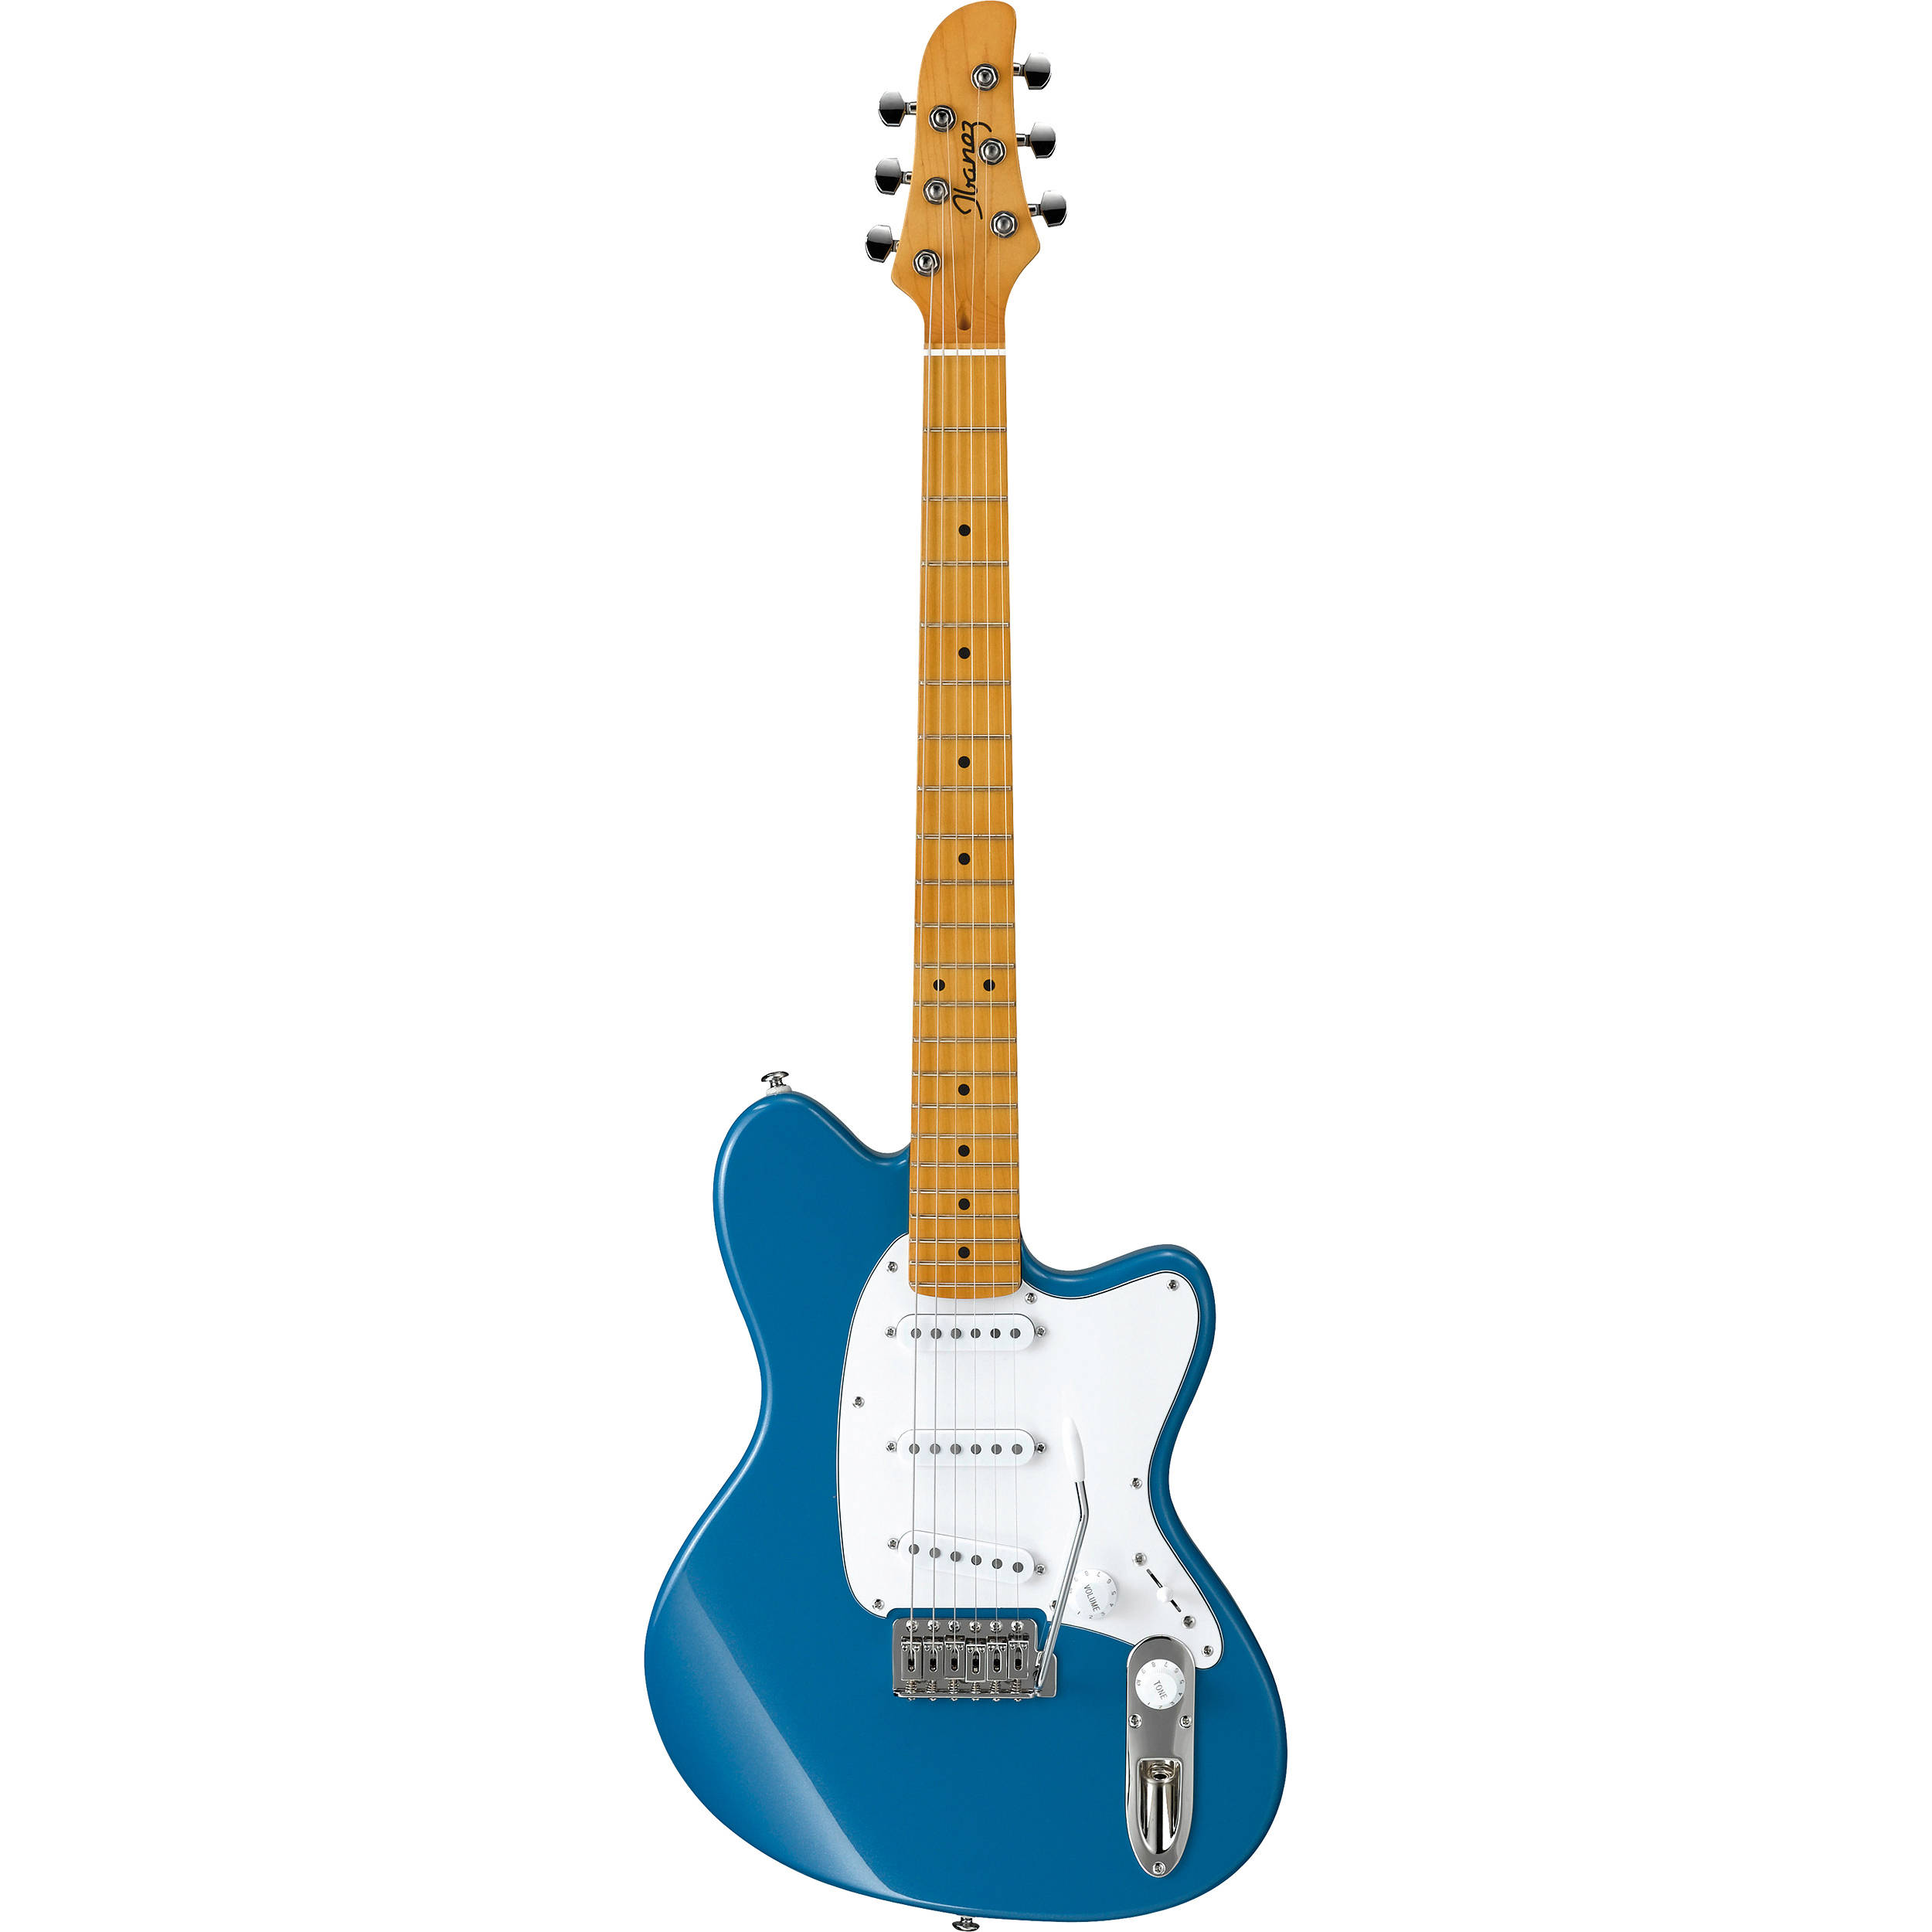 ibanez tm330m talman standard series electric guitar tm330mblb. Black Bedroom Furniture Sets. Home Design Ideas